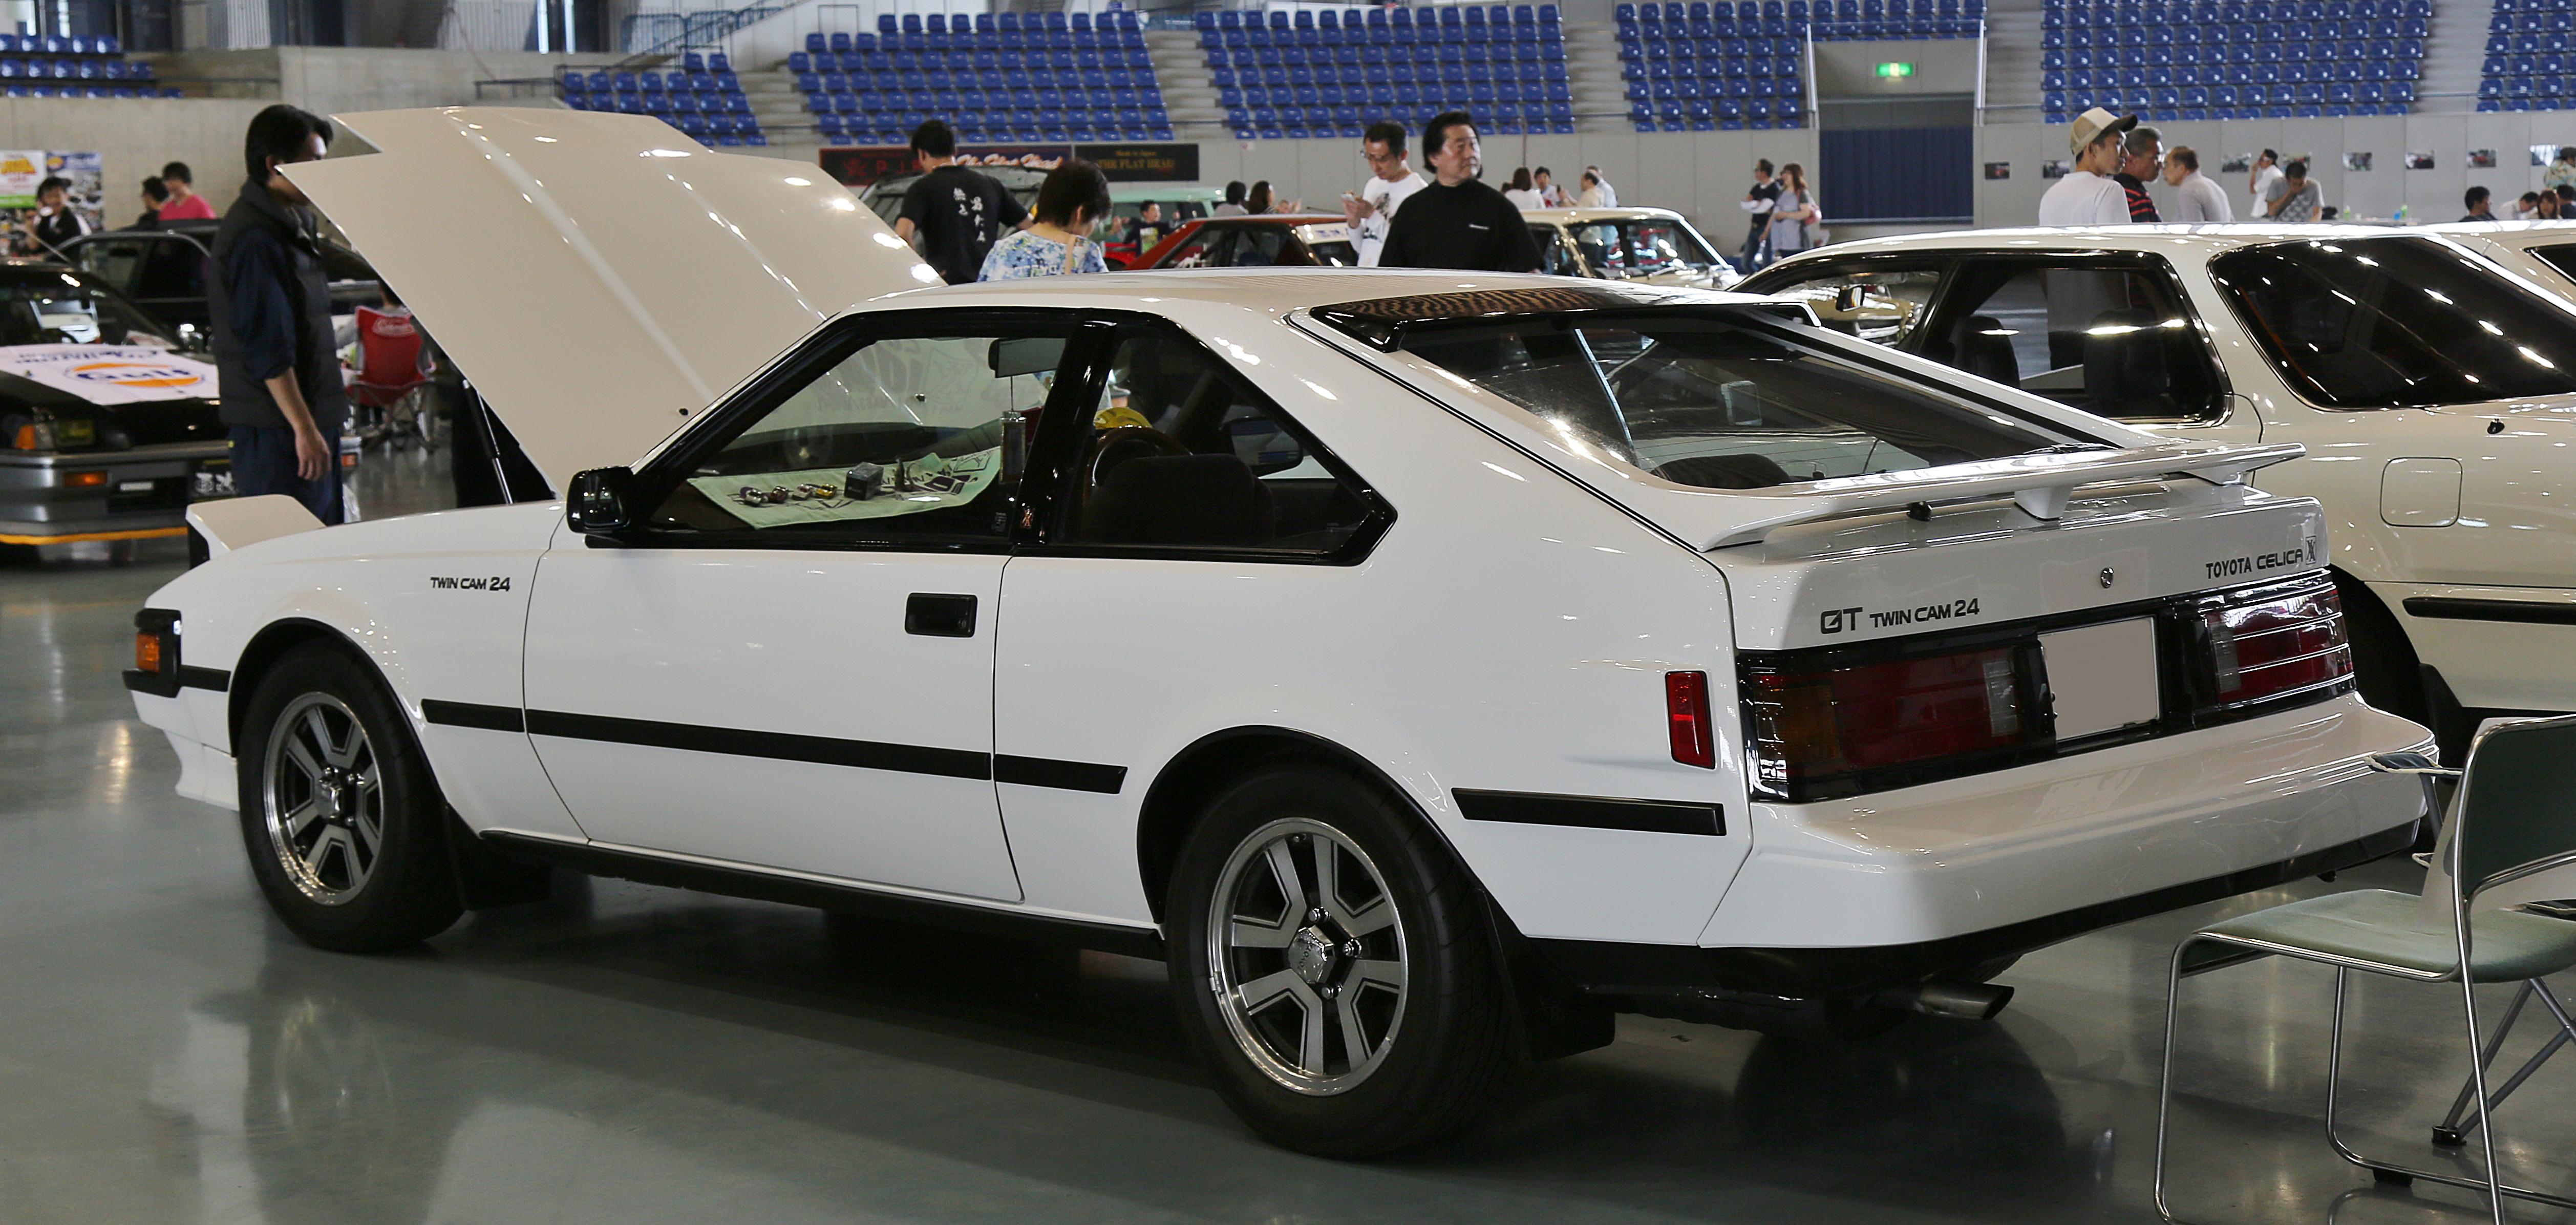 Kelebihan Kekurangan Toyota Celica 1986 Harga